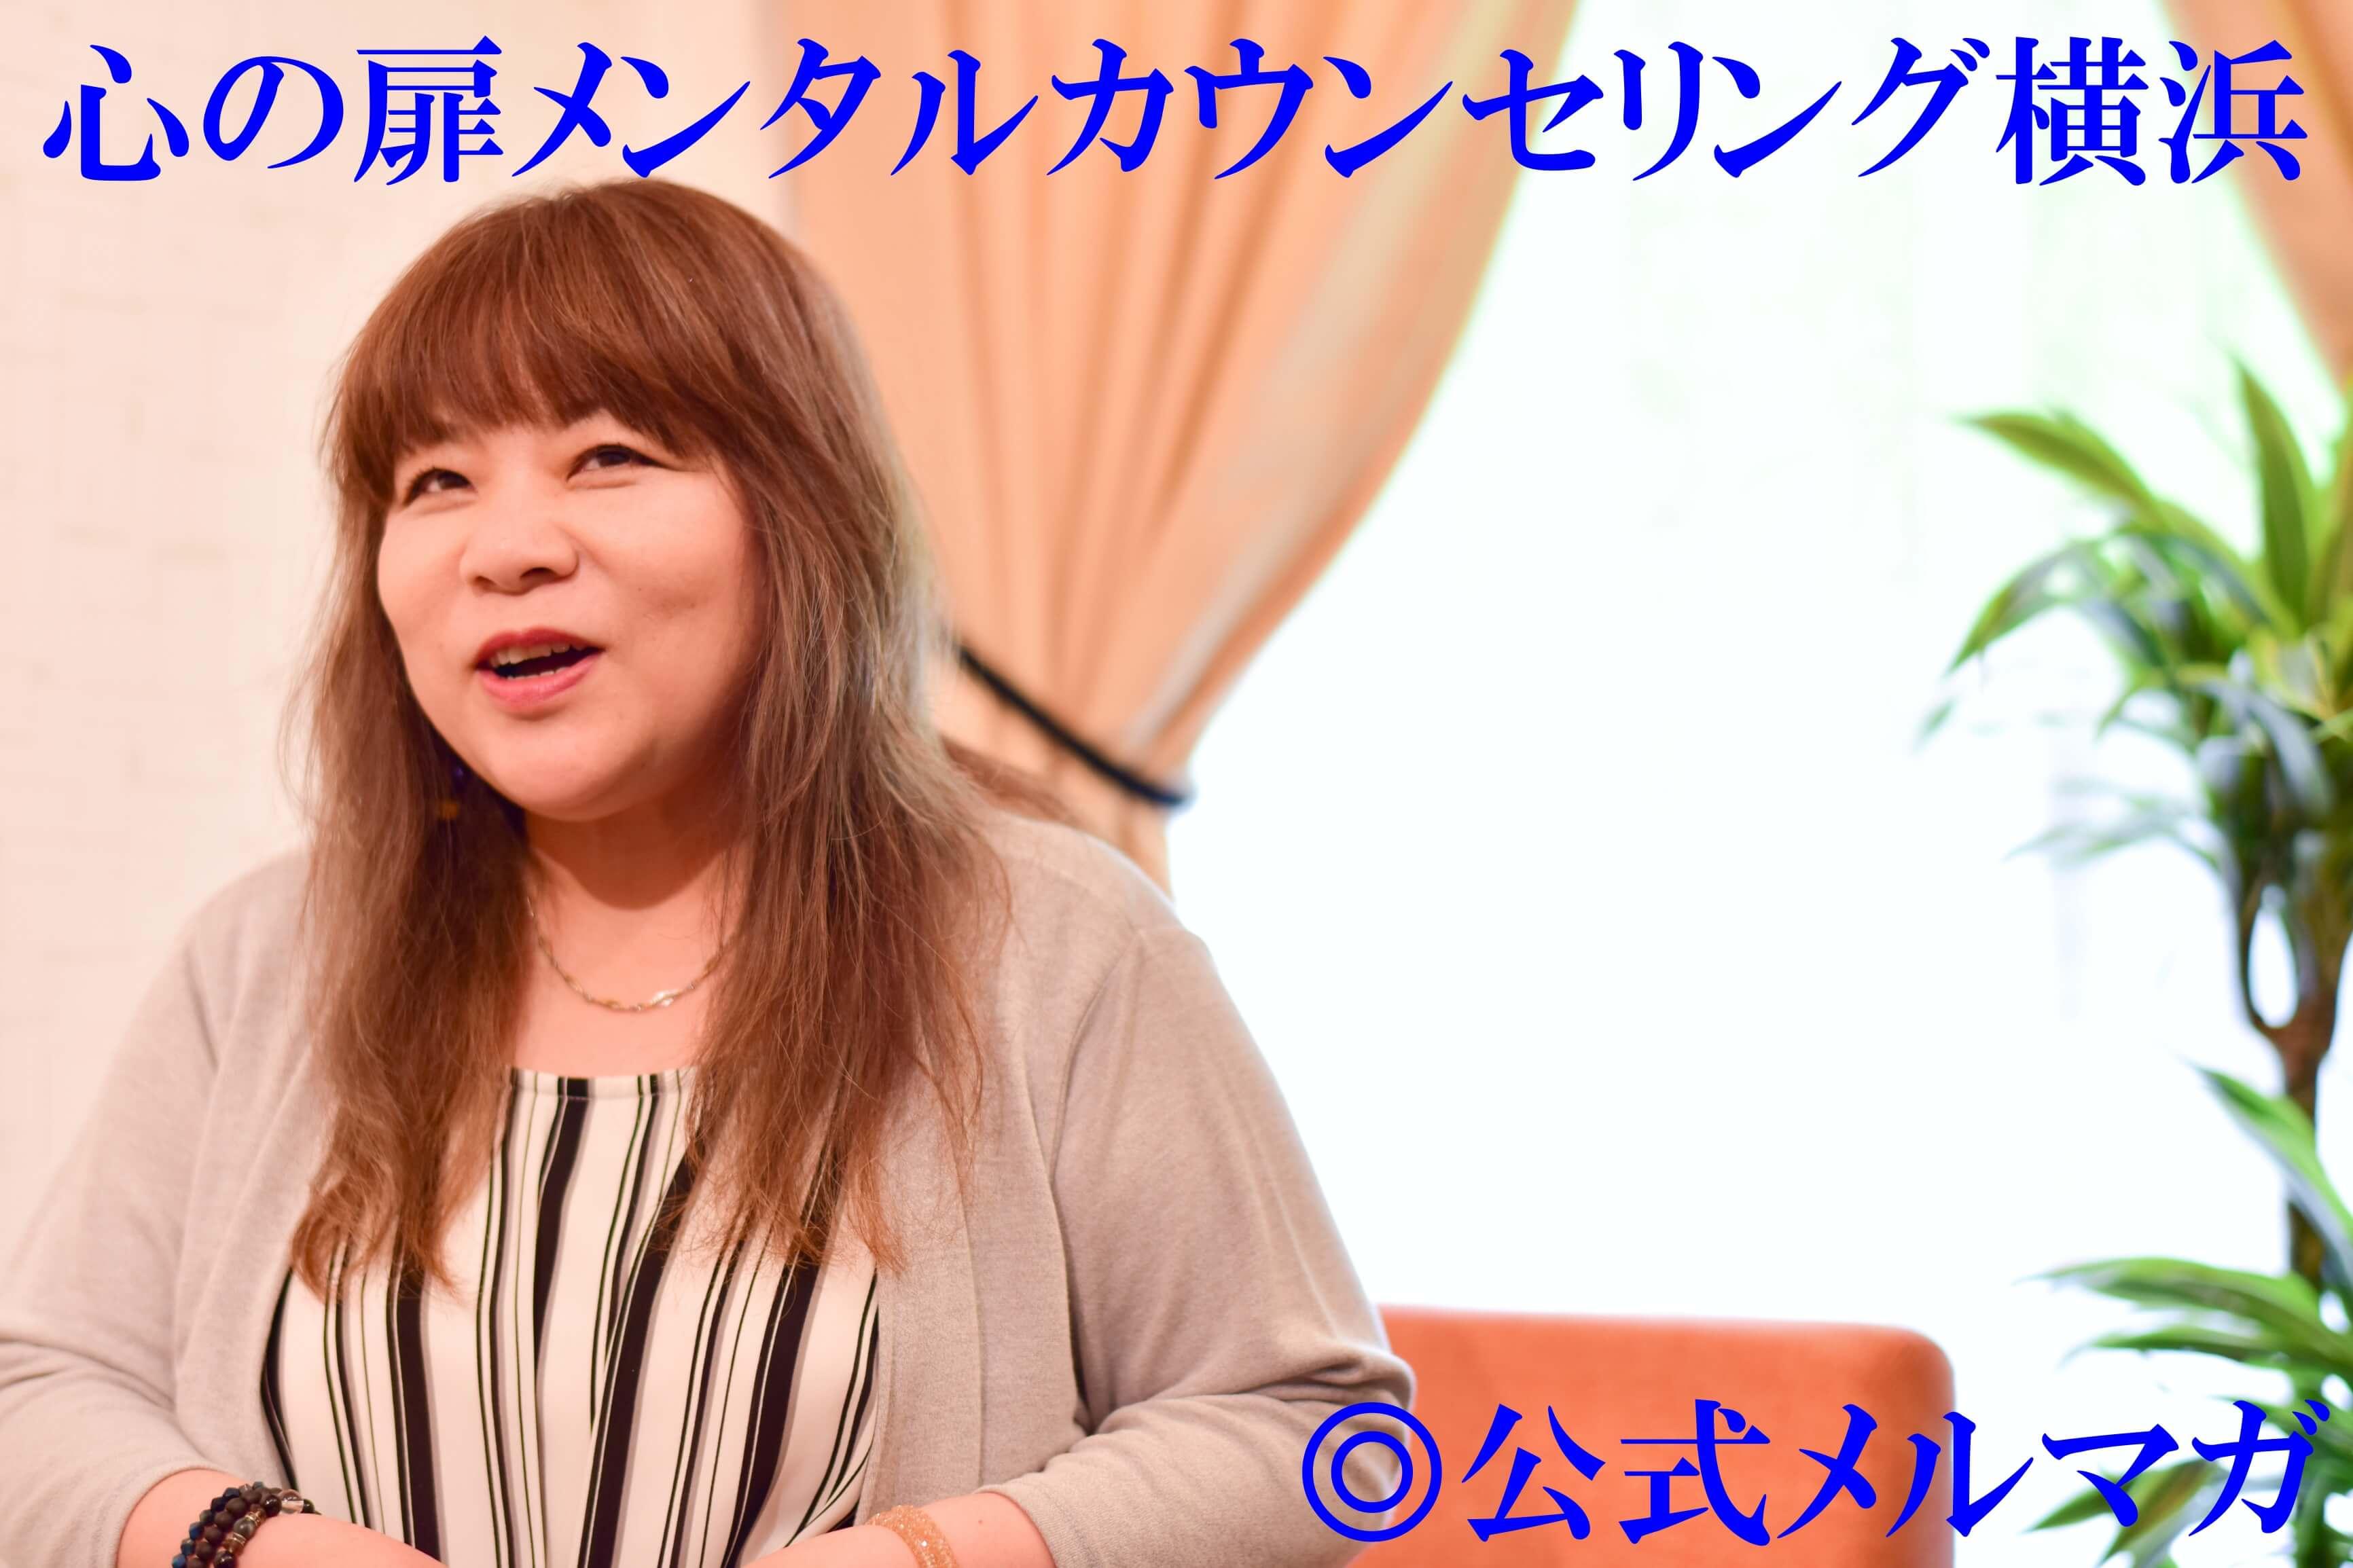 kokoronotobira-koushiki-mail-magazine